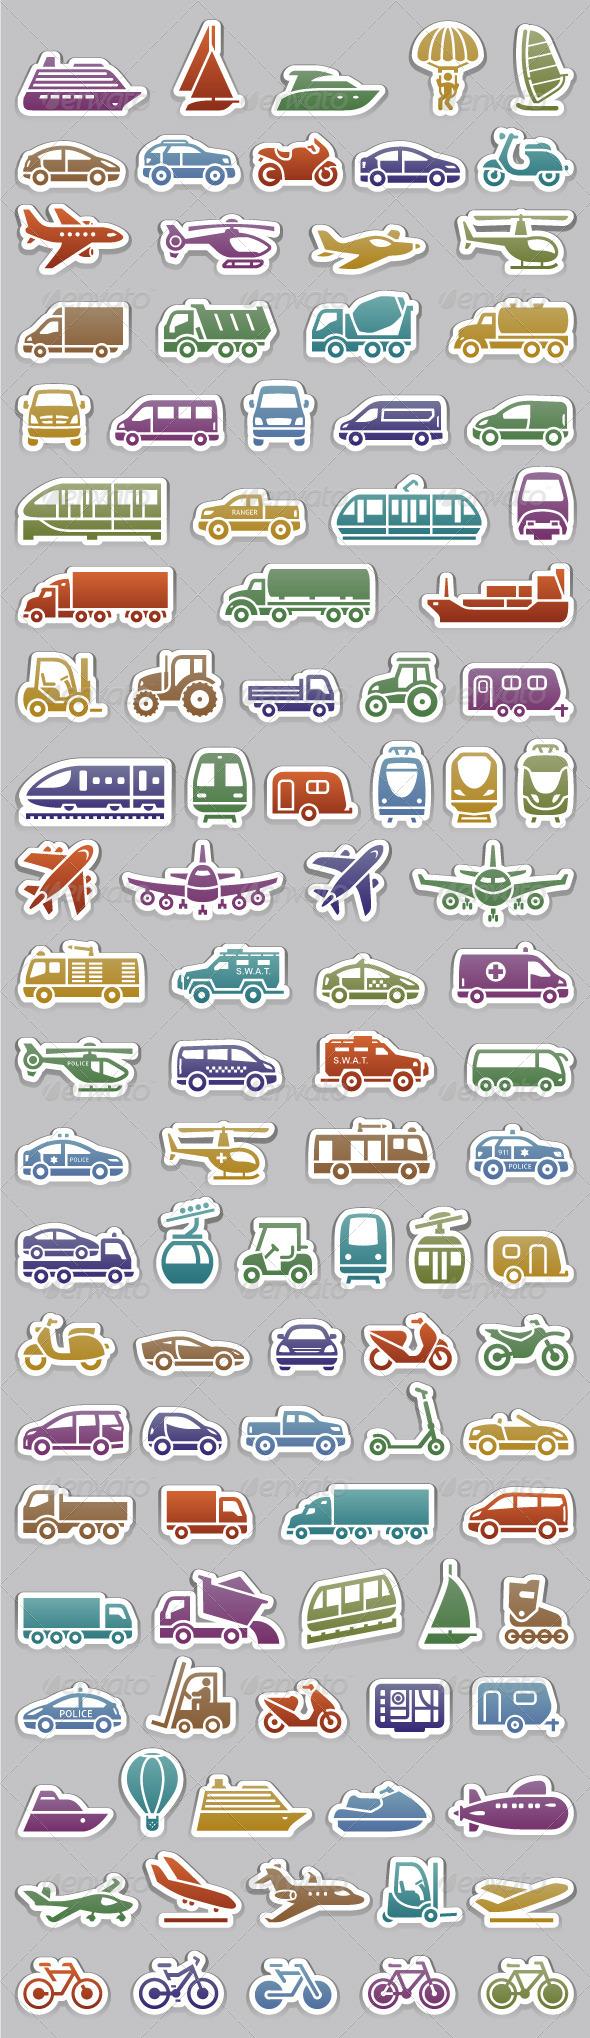 GraphicRiver 104 Transport icons set retro colors 5817291